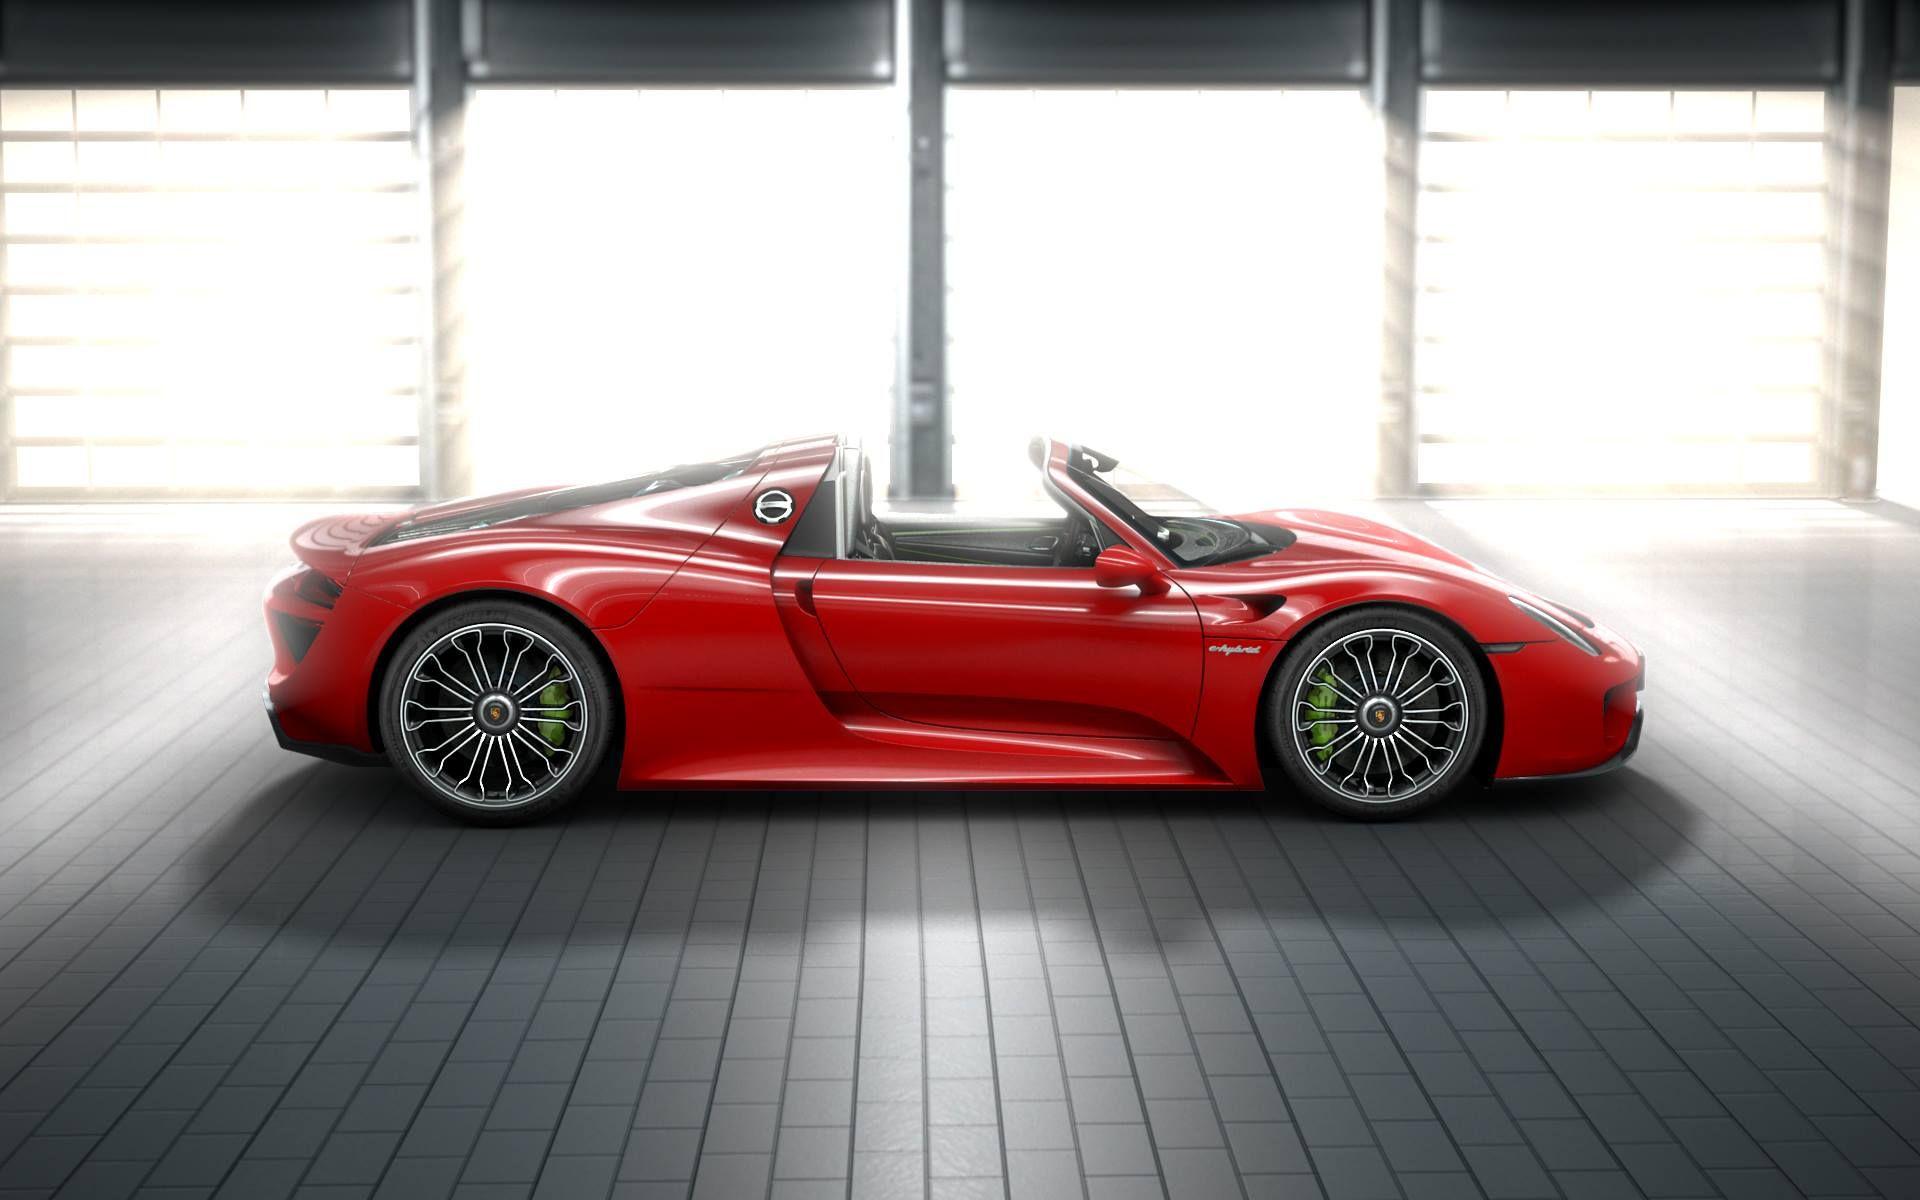 porsche 918 spyder red autos pinterest. Black Bedroom Furniture Sets. Home Design Ideas